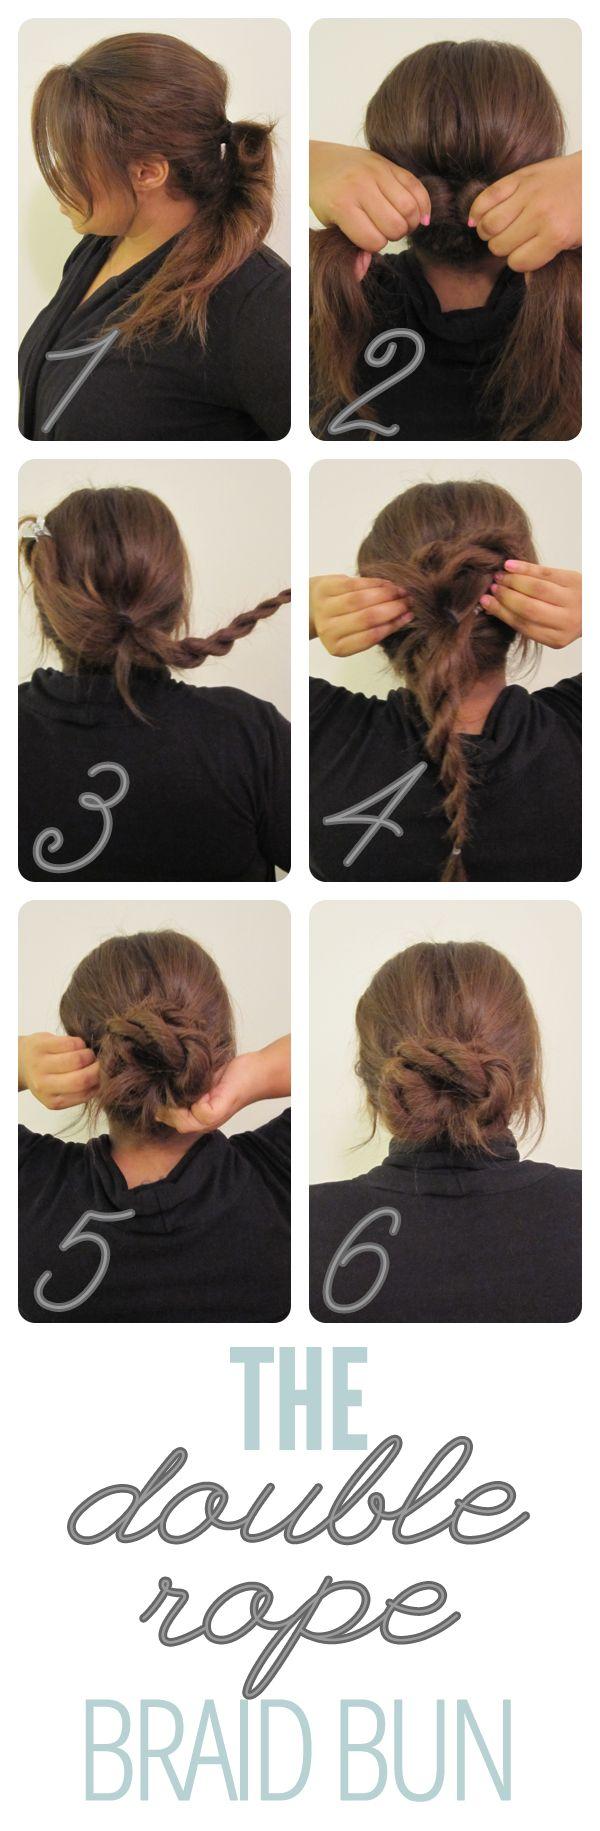 The Double Rope Braid Bun<3